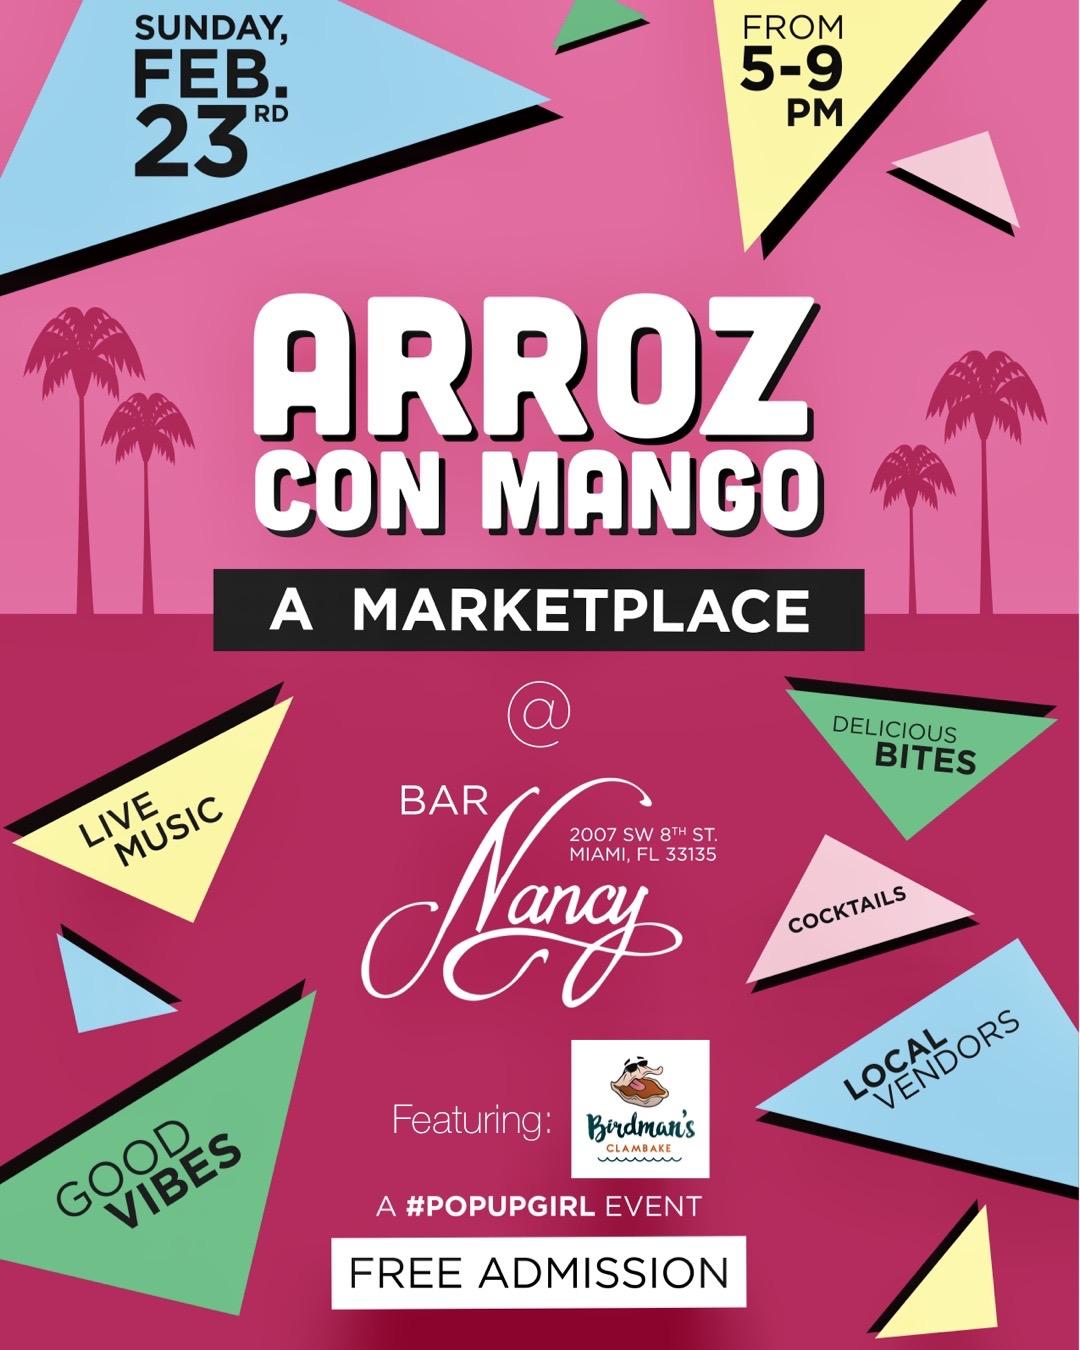 Arroz Con Mango! A Marketplace! Feat. Birdman's Clambake! at Bar Nancy